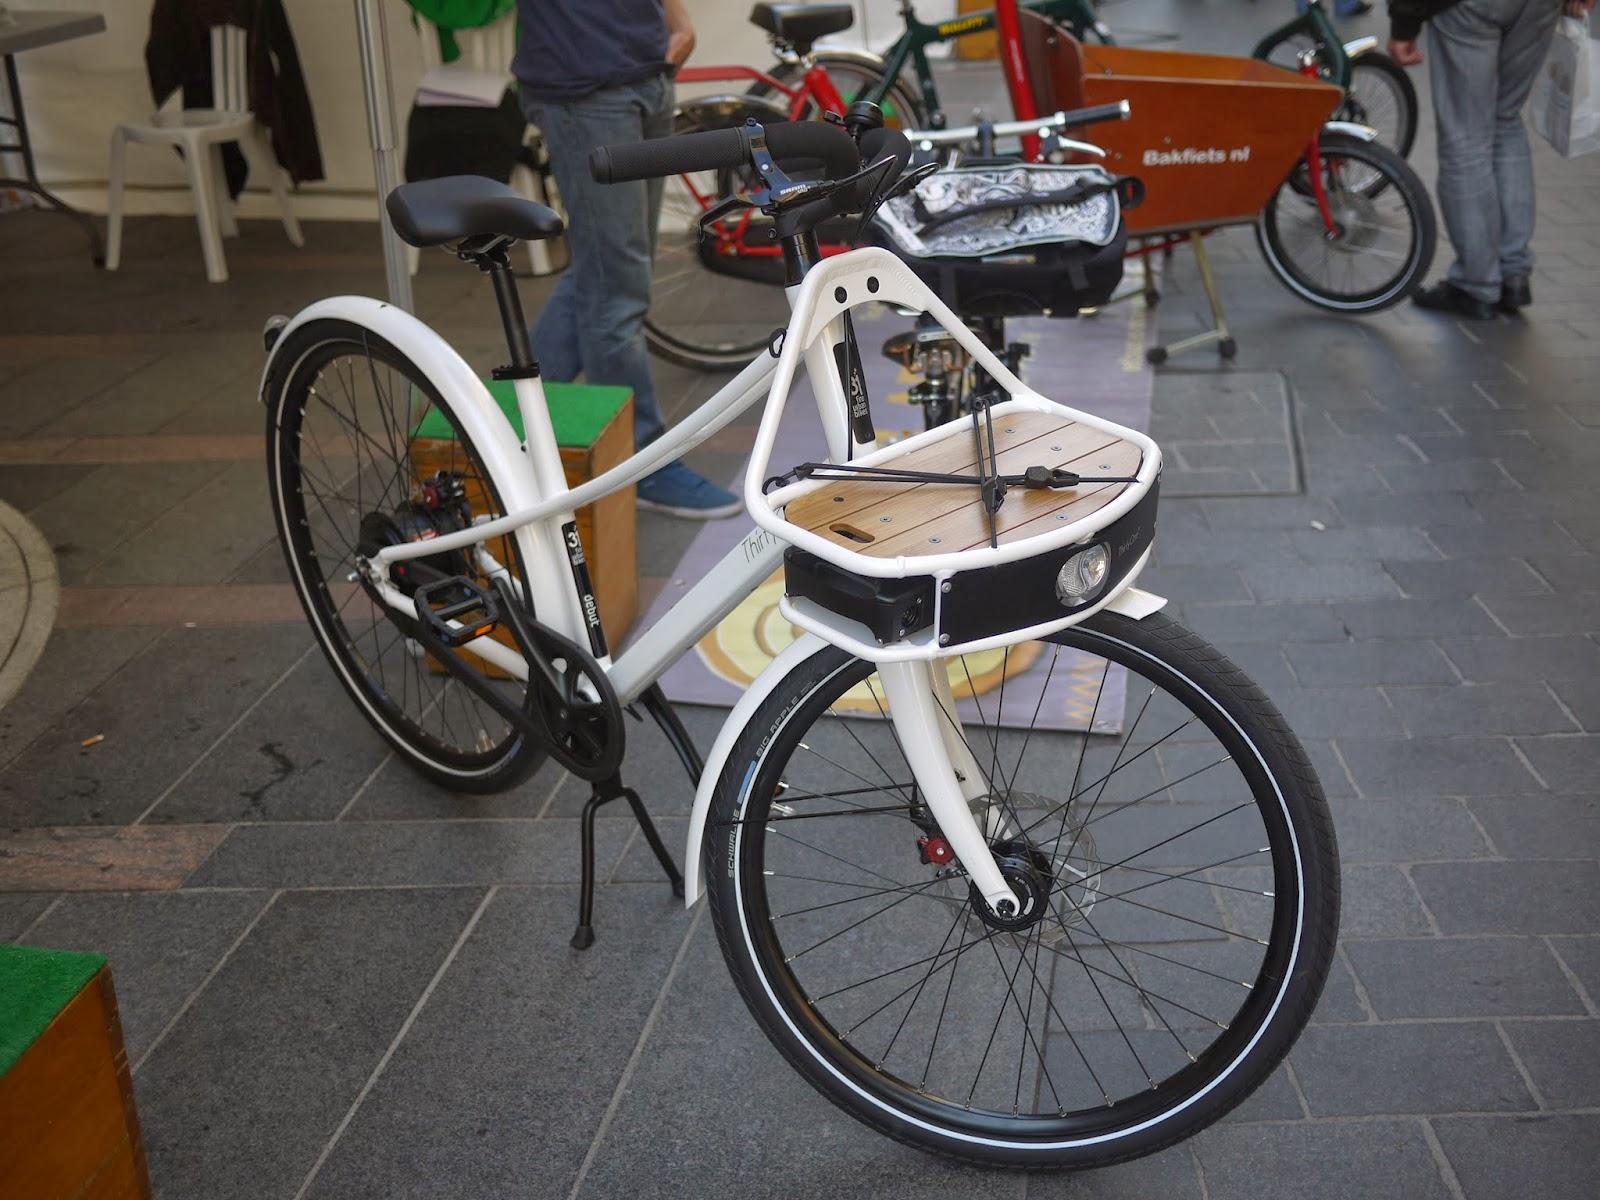 VAE Thirty One fabriqué à Saint-Gaudens